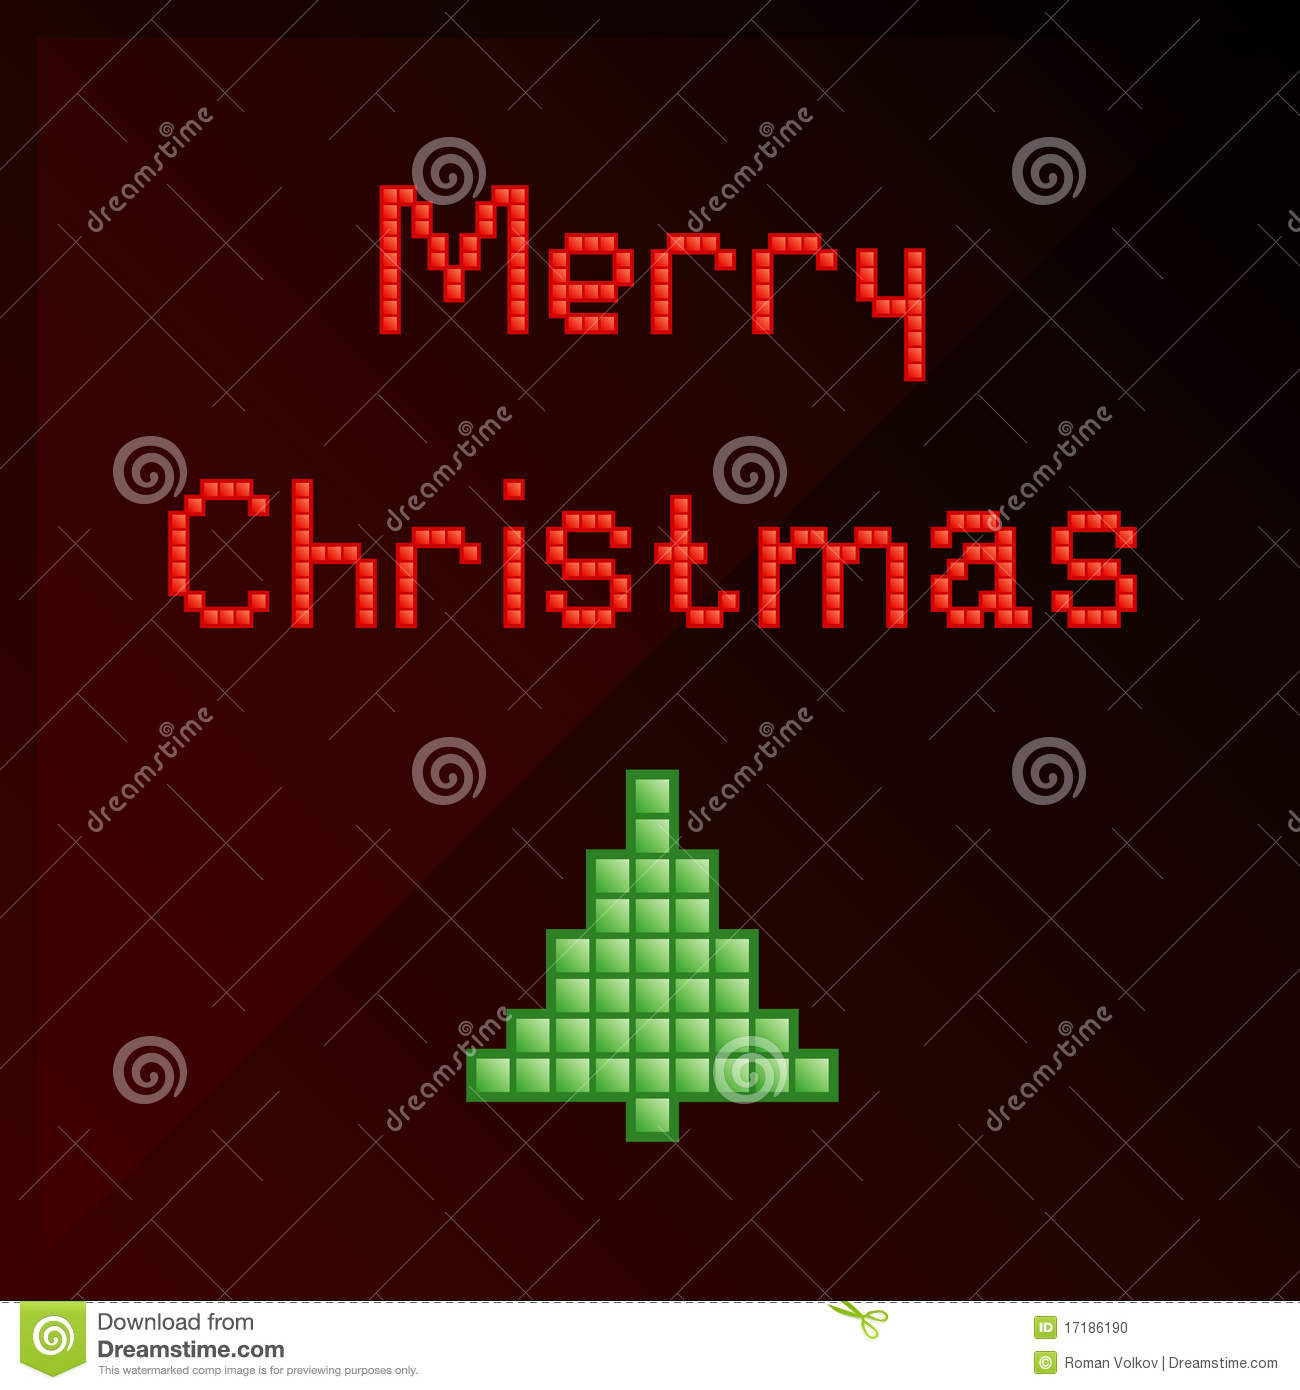 Pixel Art Christmas Card Stock Vector. Illustration Of Merry avec Pixel Art De Noël